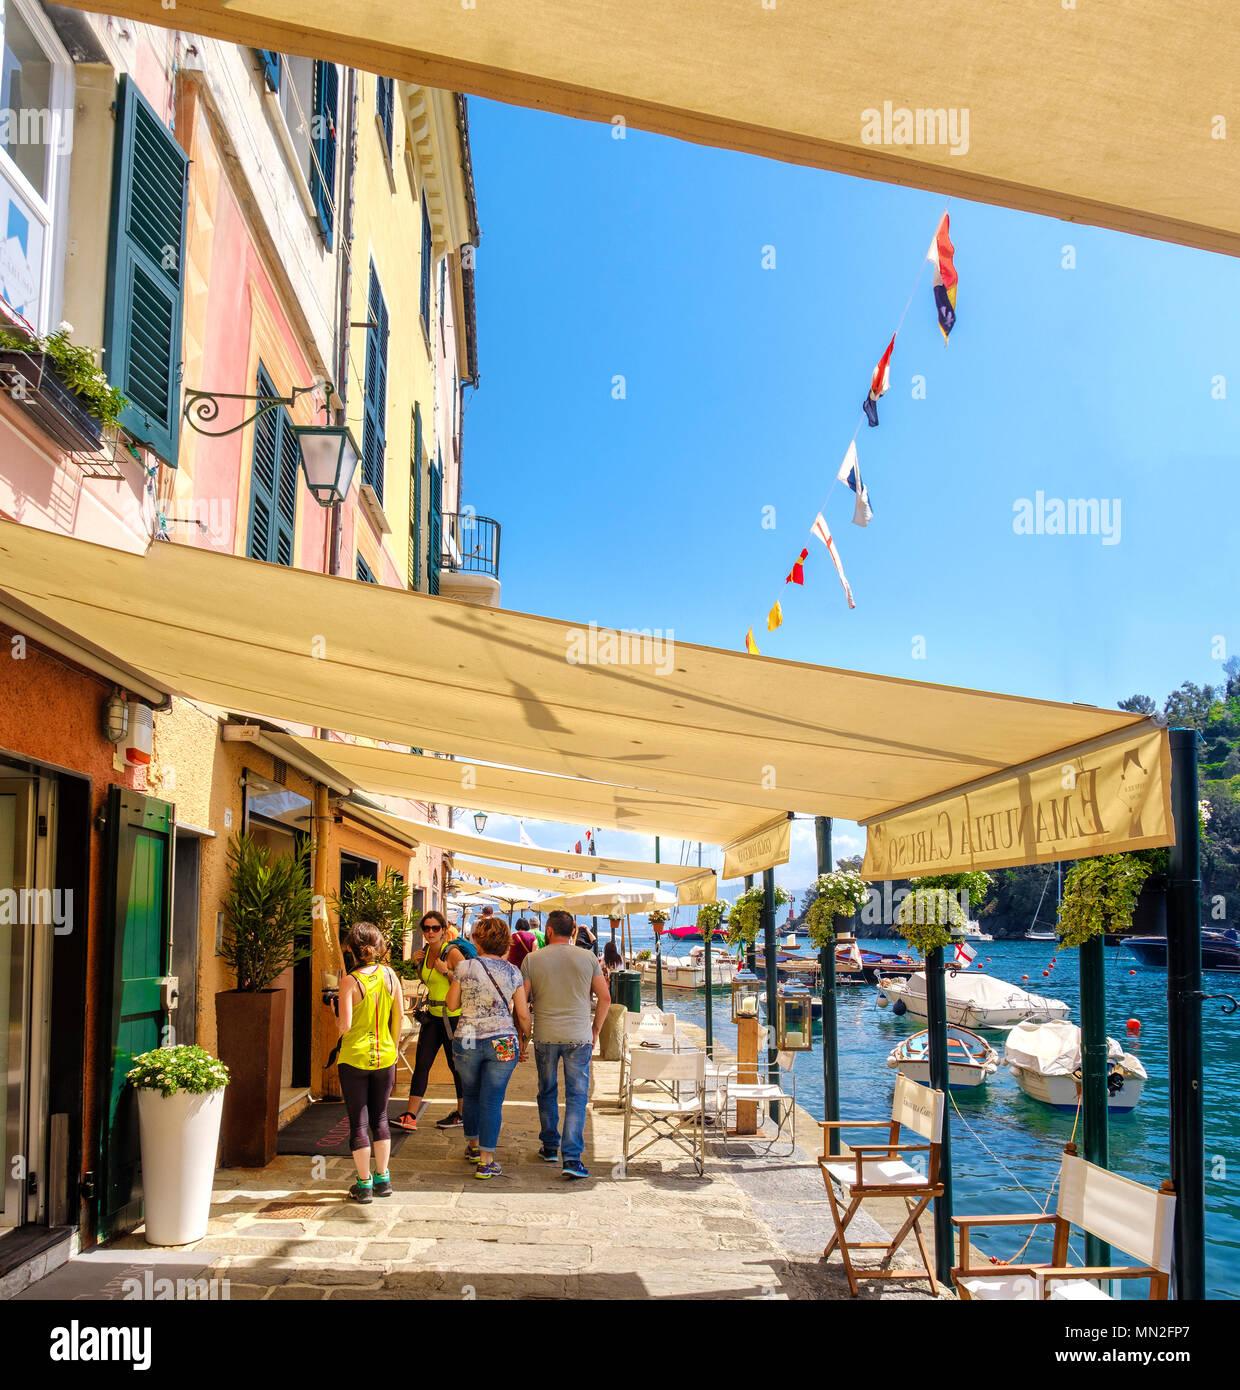 shopping in Portofino Liguria tourists visit Italy shops awning - Stock Image